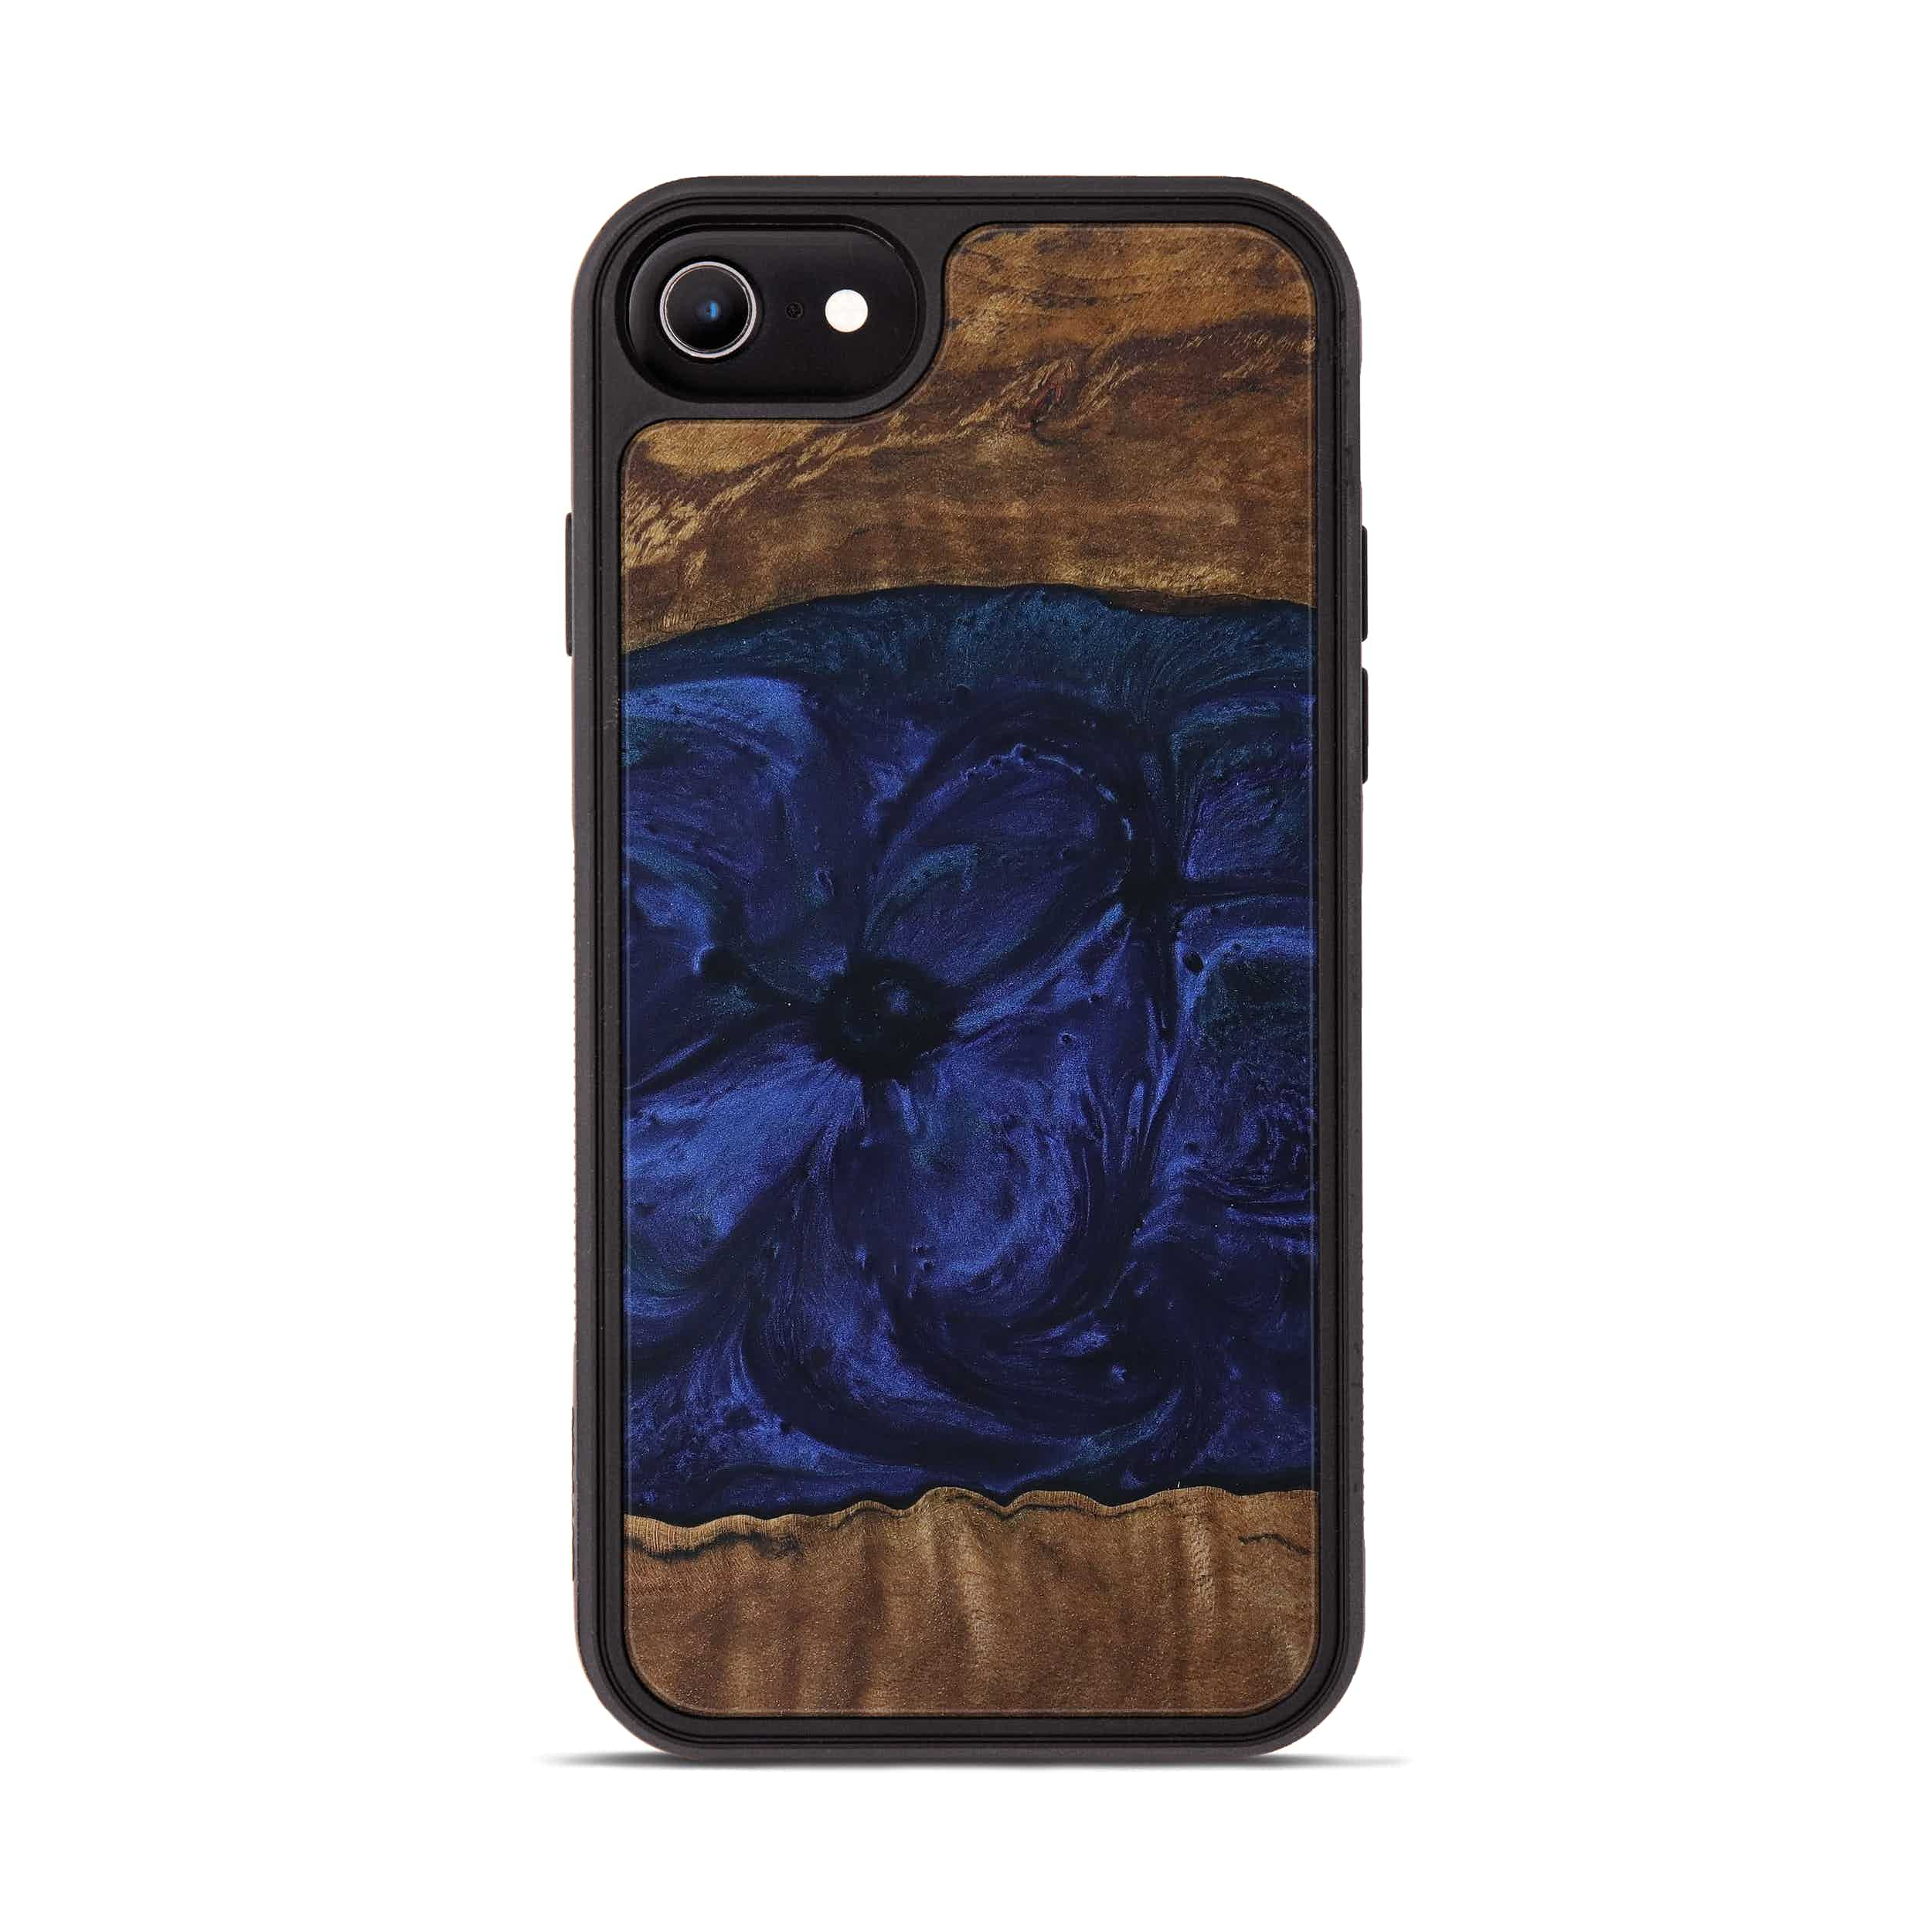 iPhone 7 Wood+Resin Phone Case - Neena (Dark Blue, 399631)